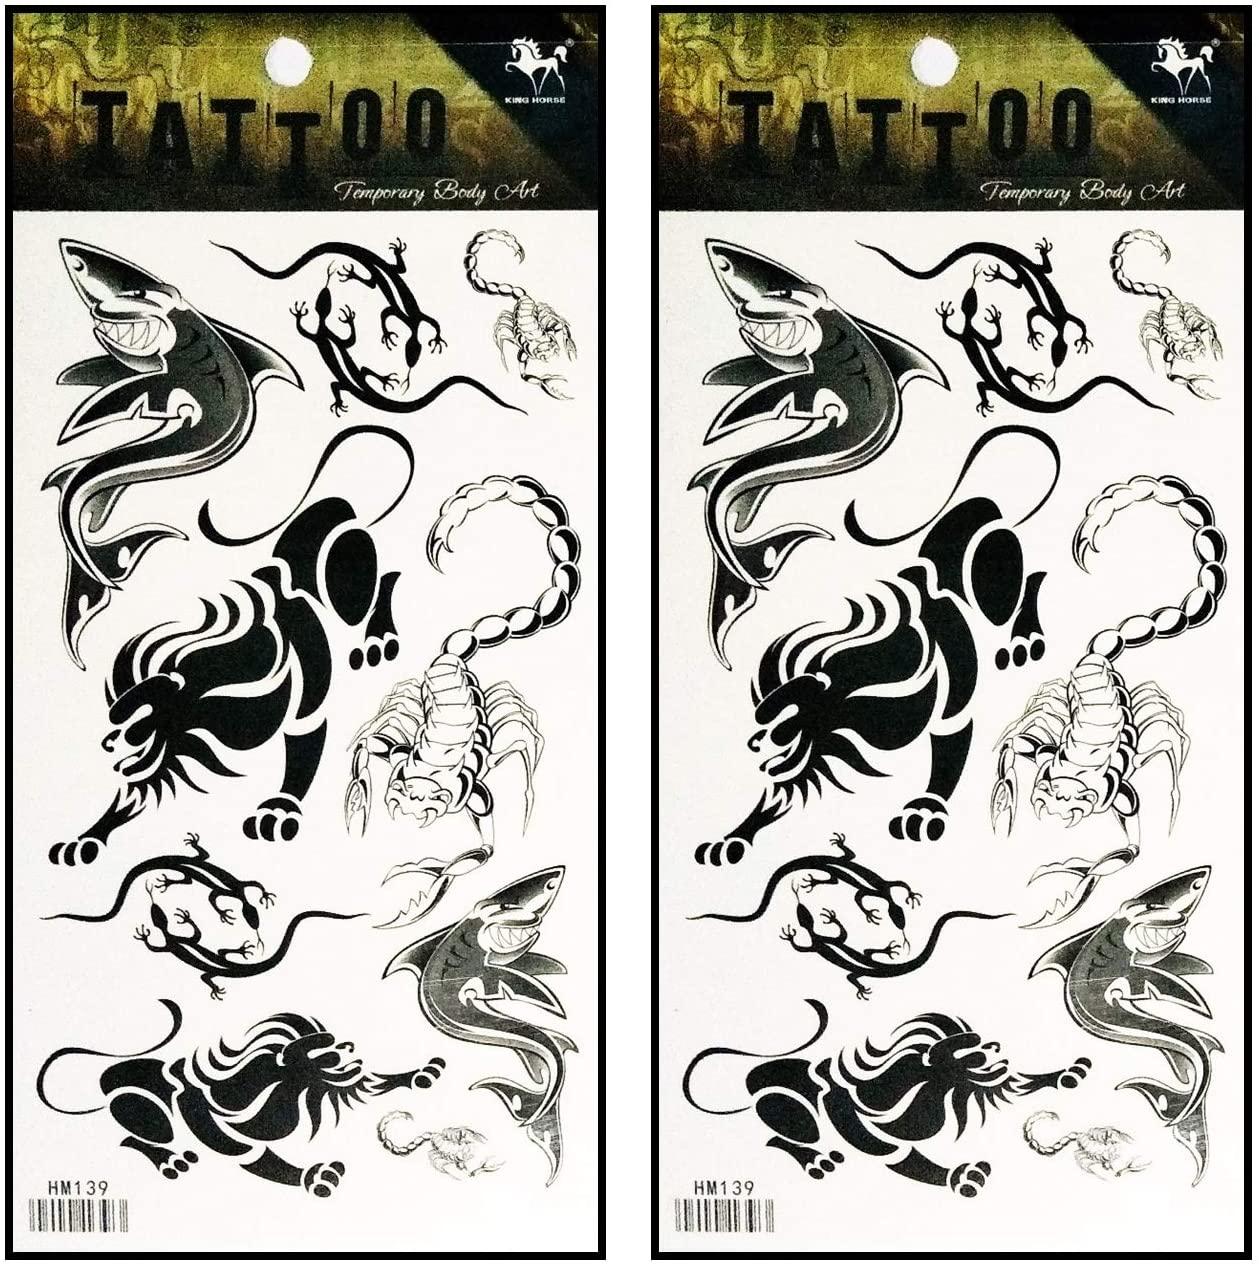 Tattoos 2 Sheets Lion Scorpion Lizard Shark Animal Waterproof Temporary Fake Tattoo Stickers Body Art Removable for Men Women